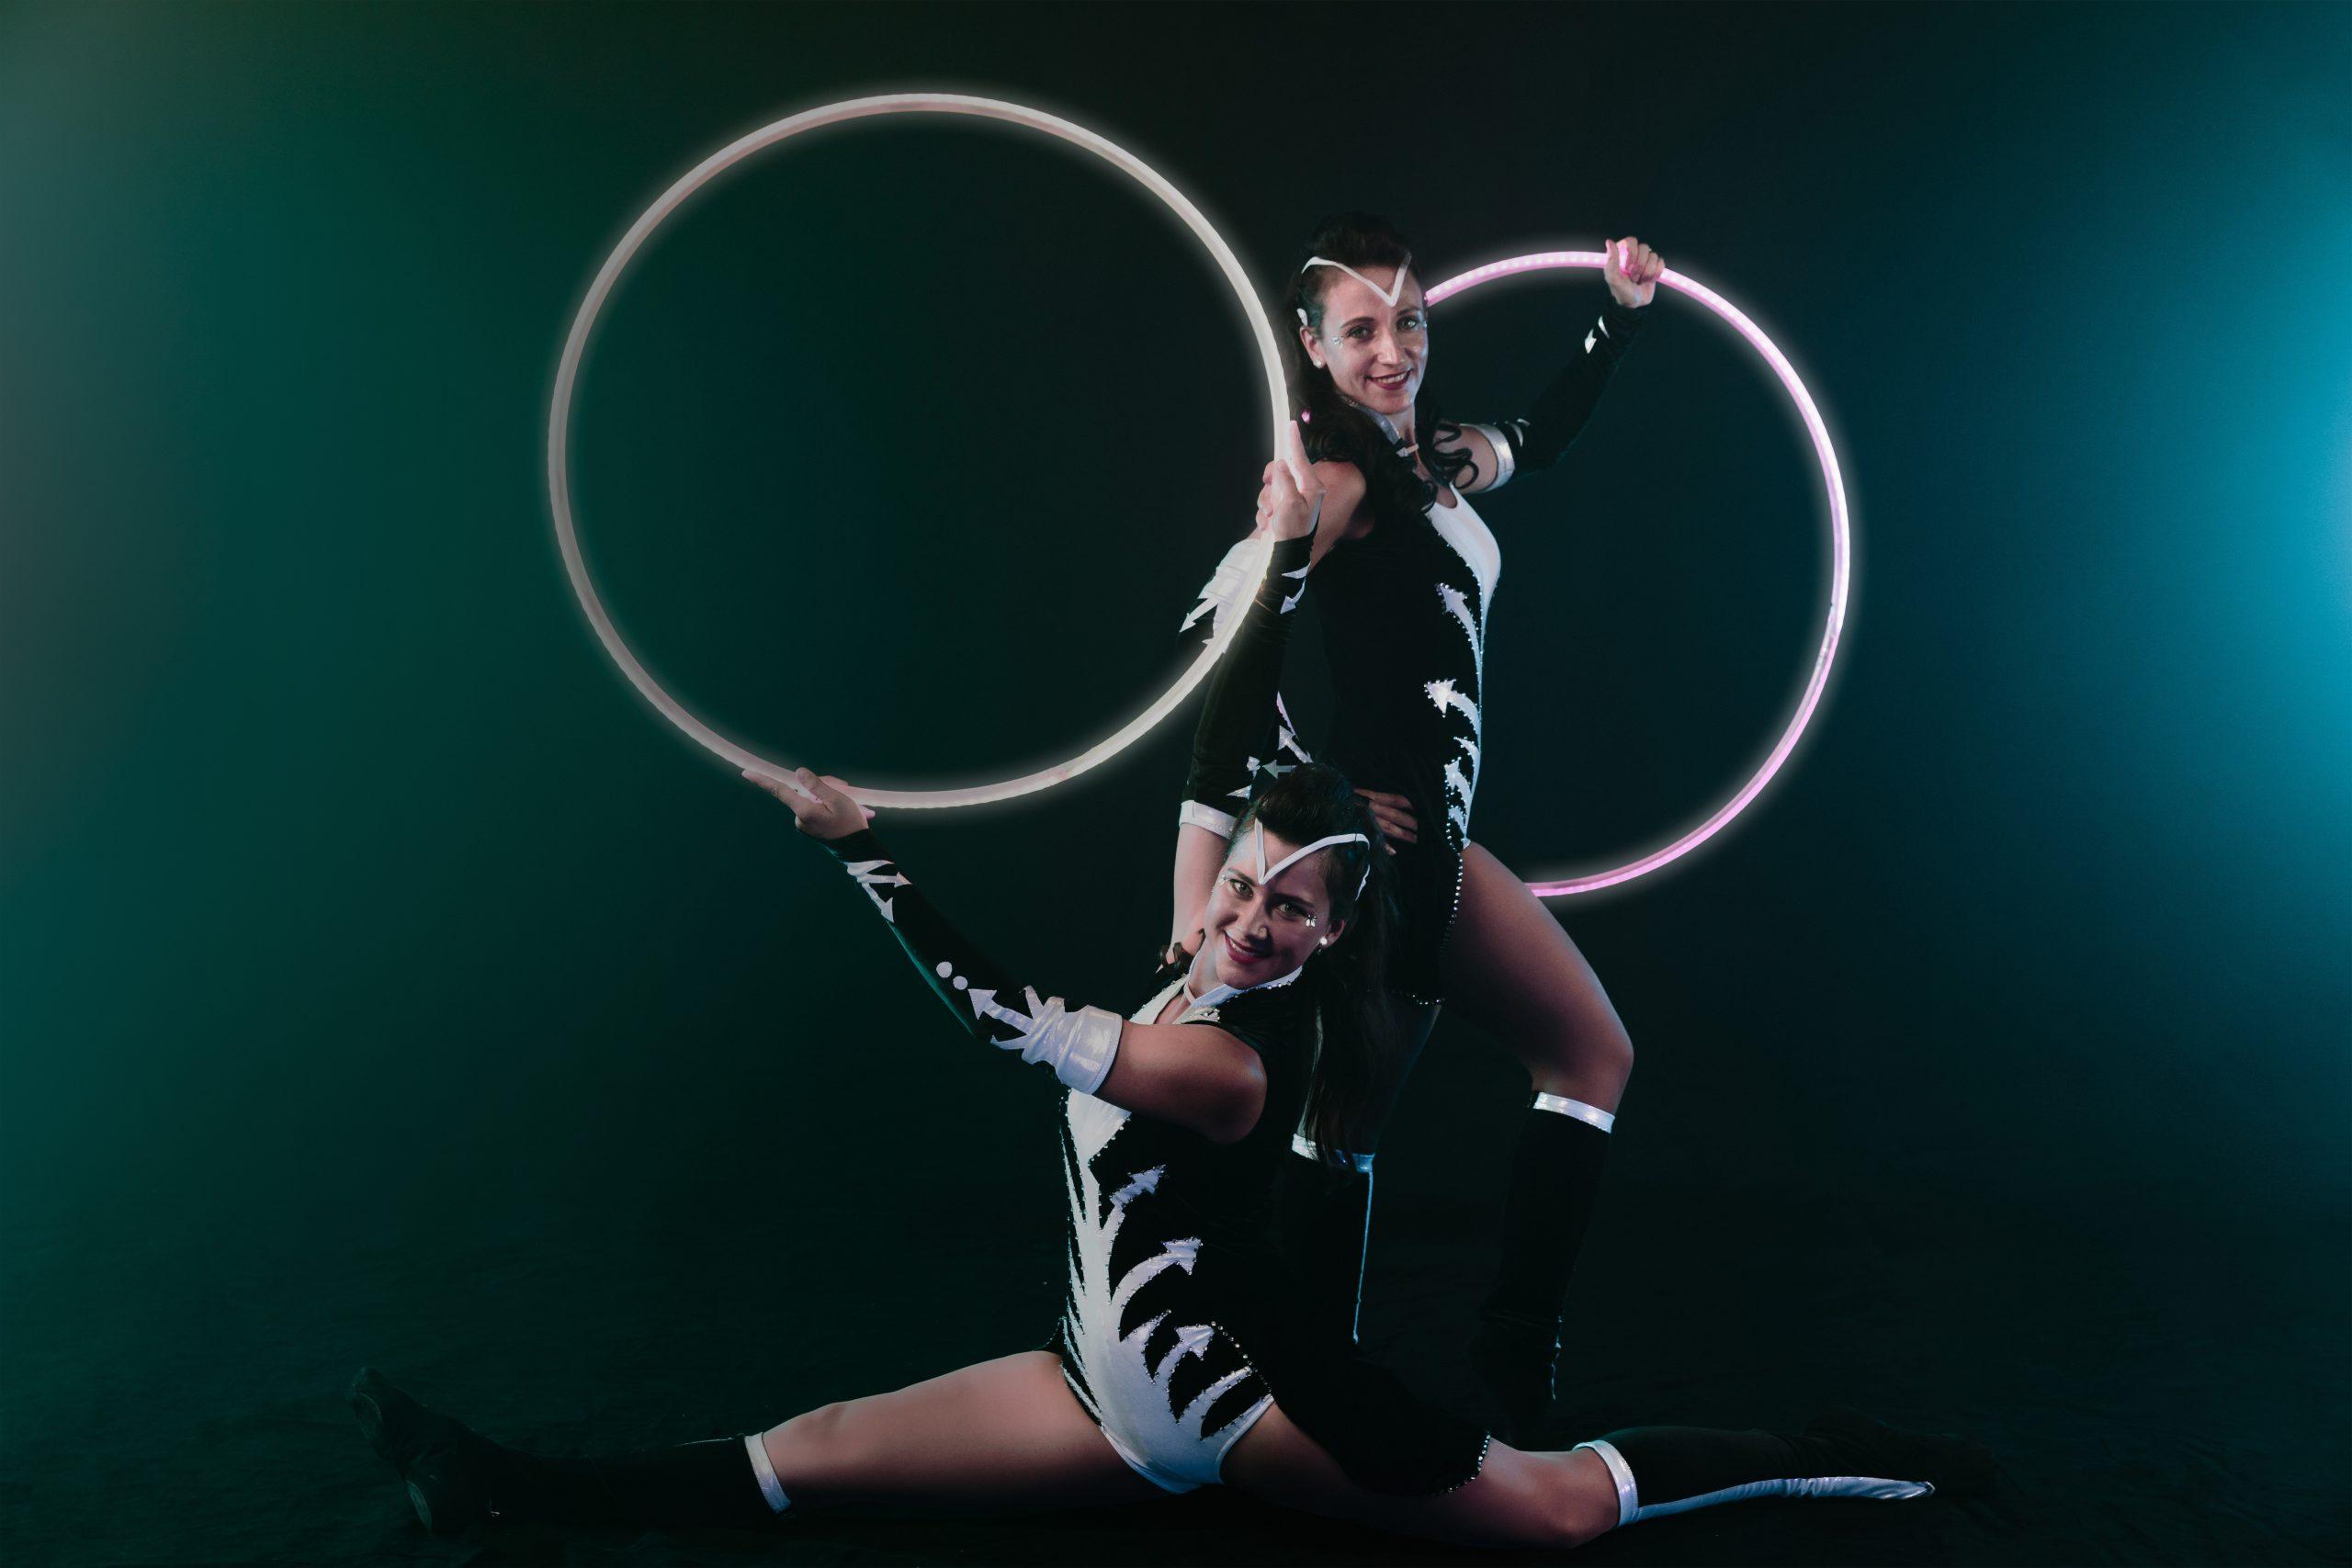 Ilusias - Art of Lights show